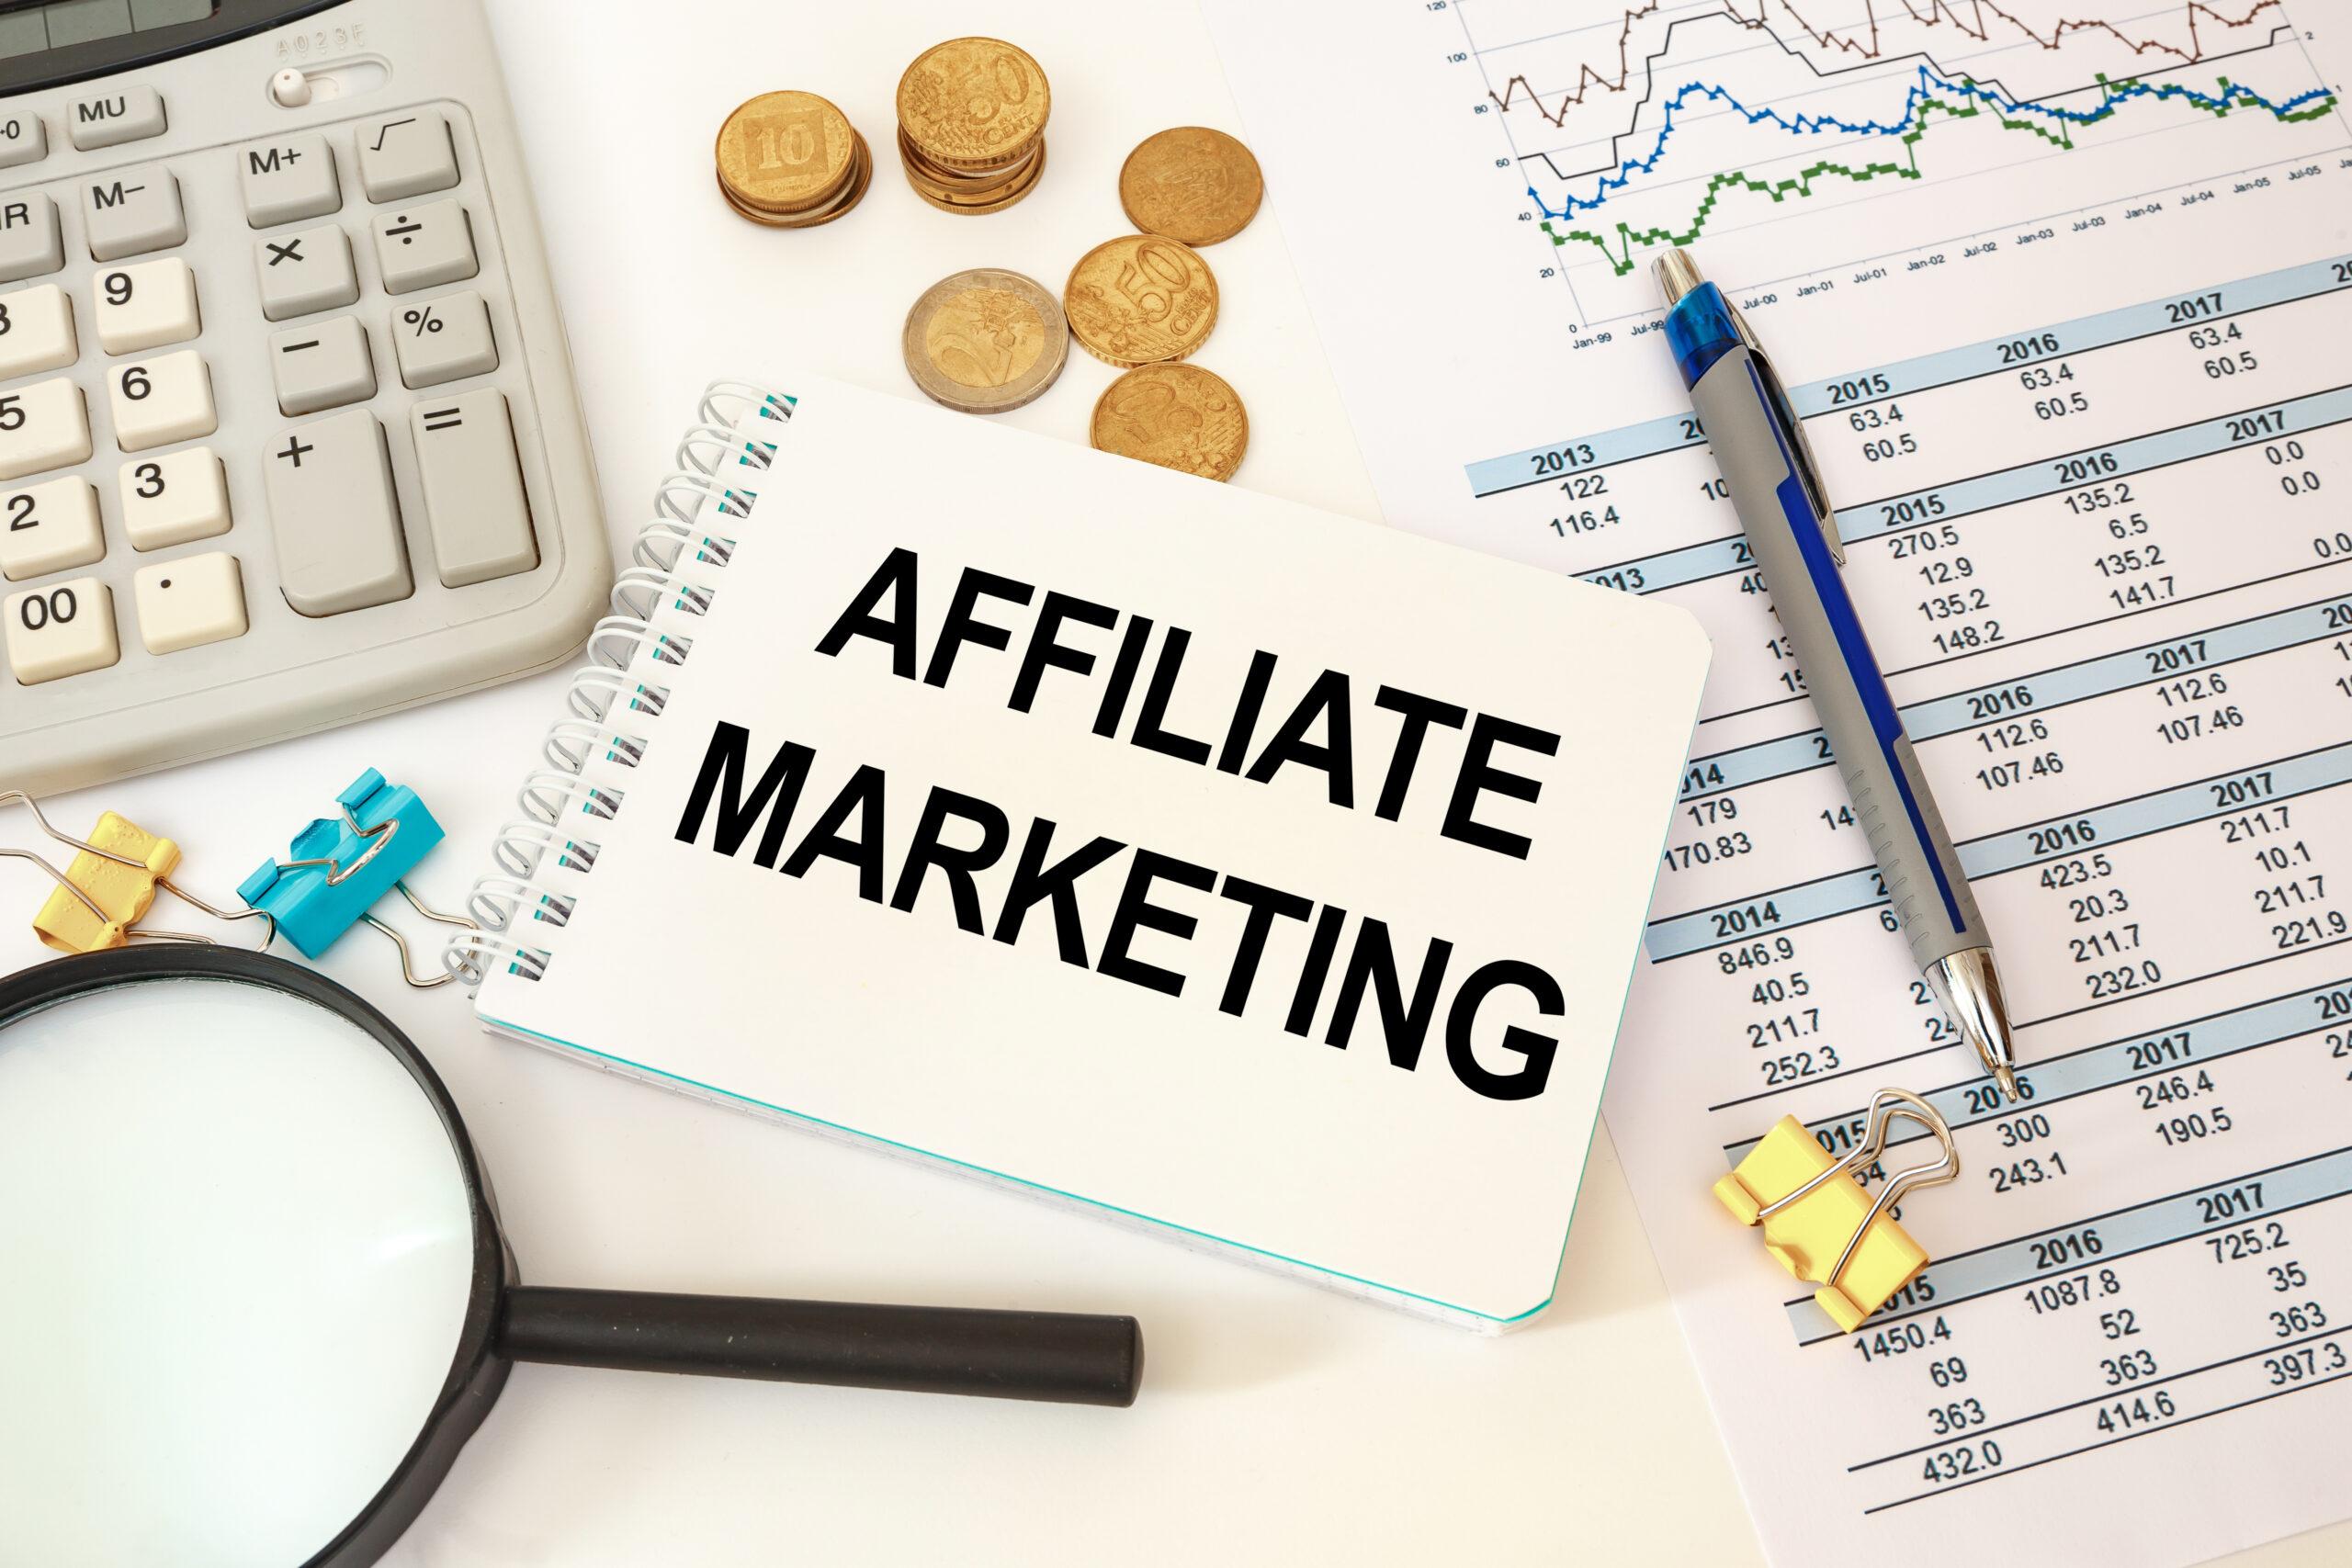 Start affiliate marketing